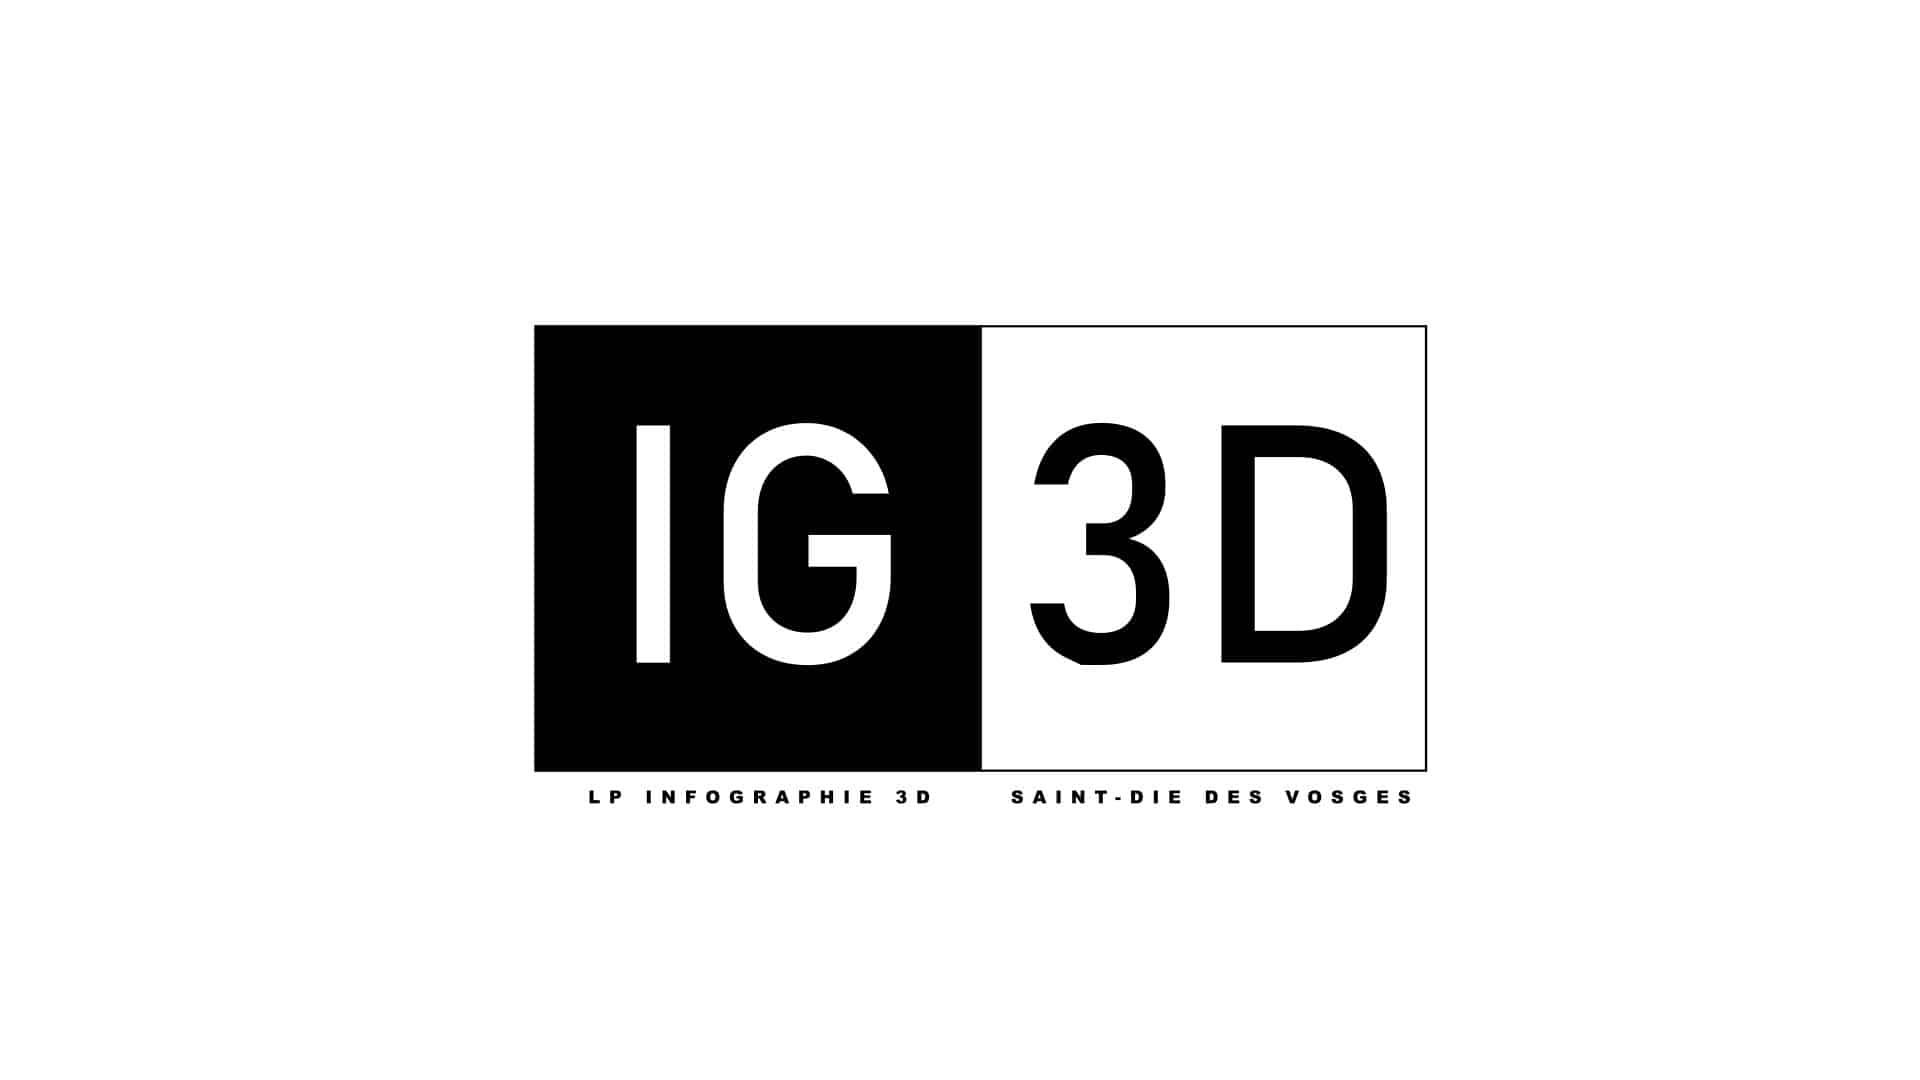 GALVAO_LOGOIG3D.mp4_snapshot_00.16_2019.12.04_23.57.40